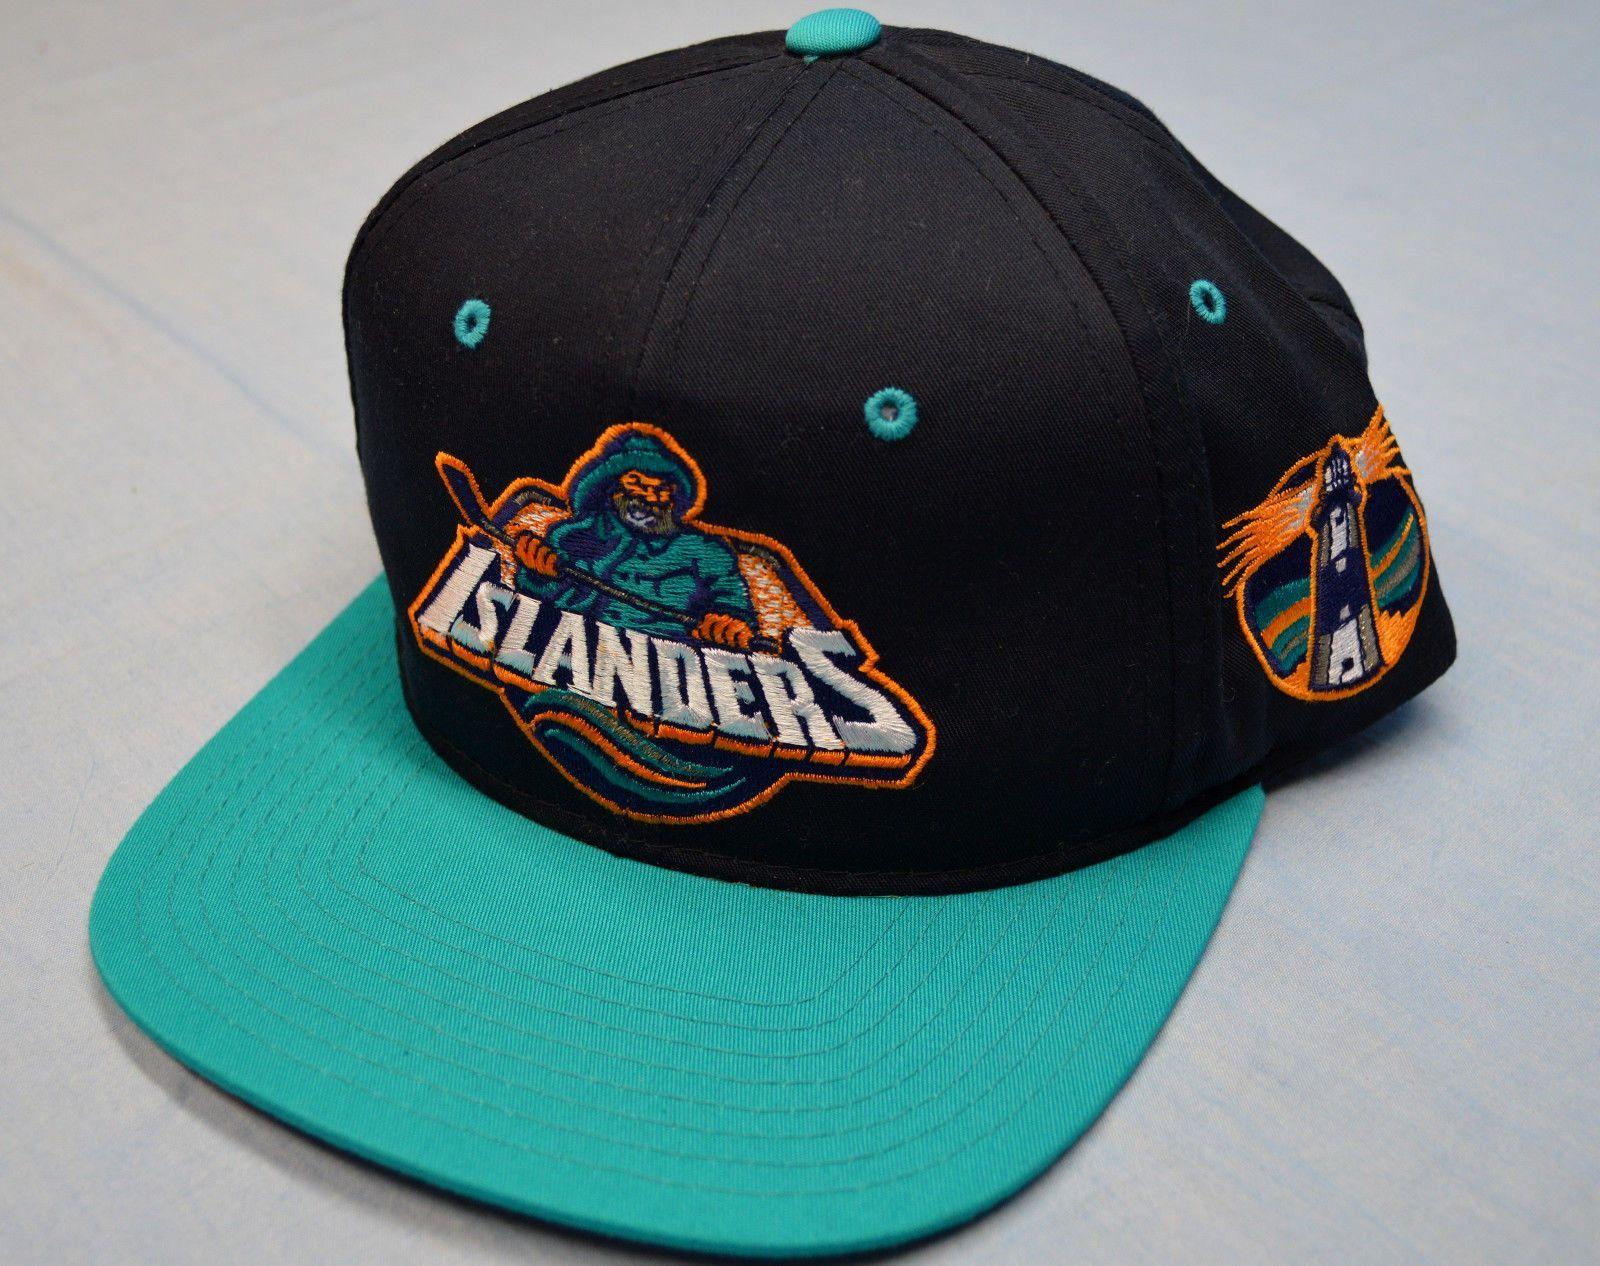 b2f95dc0376 Sports Specialties NY Islanders ca.1996 (fisherman) Logo Snapback ...